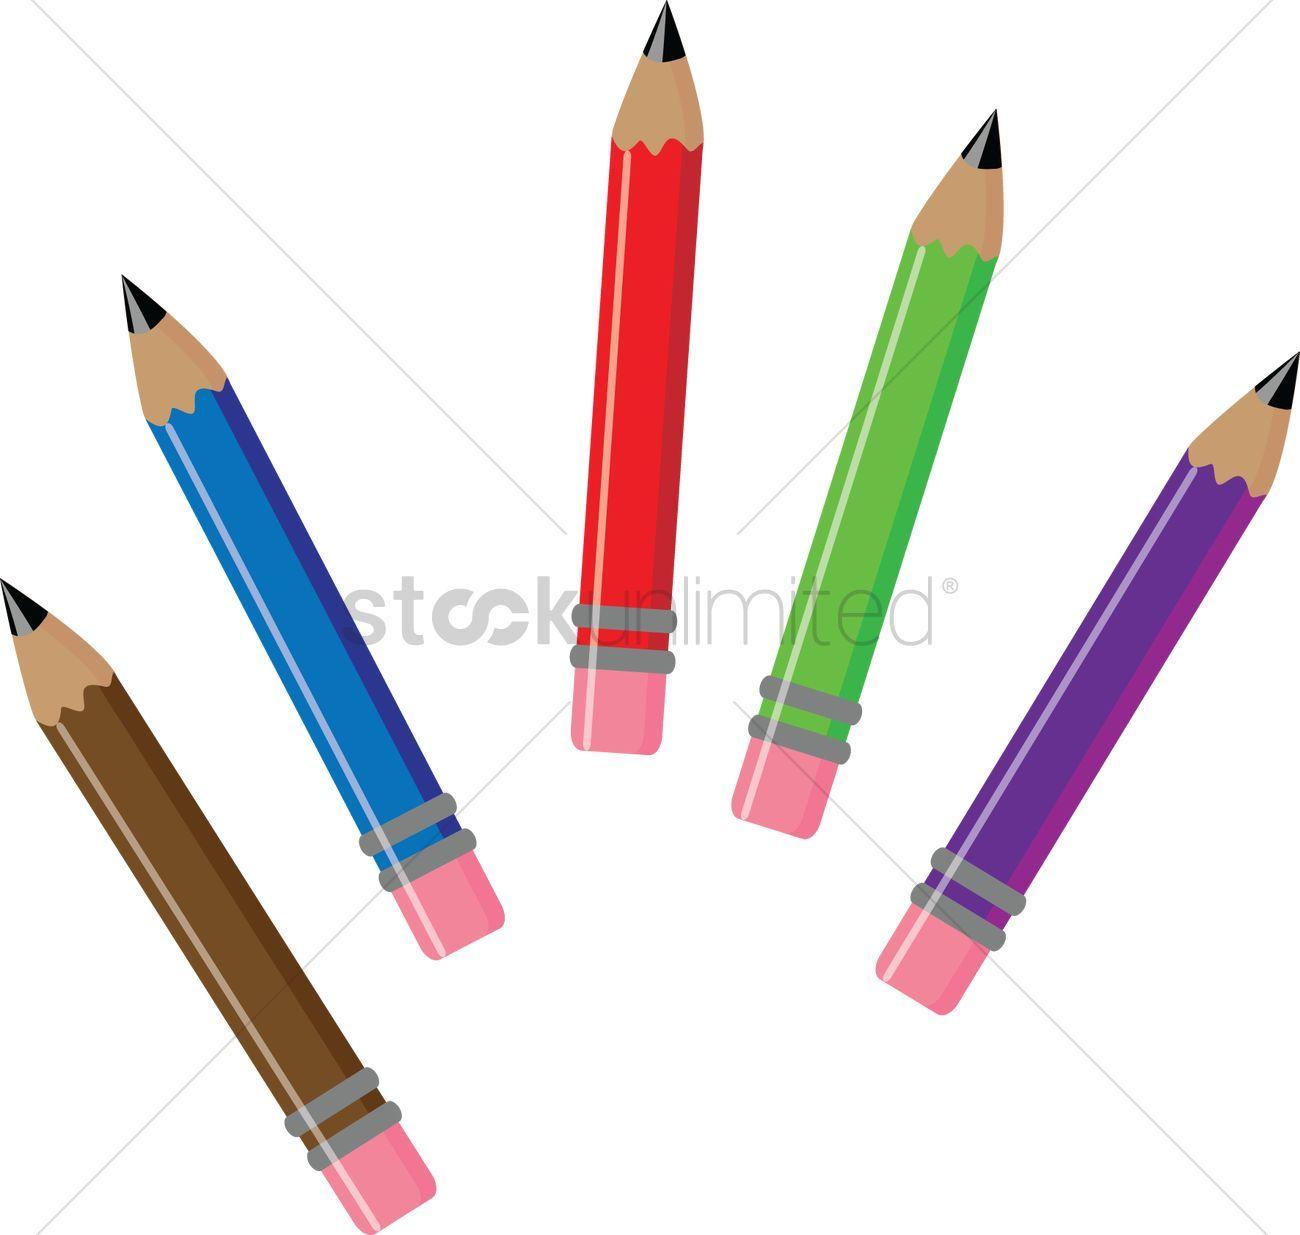 6 pencils clipart clip freeuse library 5 pencils clipart 6 » Clipart Portal clip freeuse library